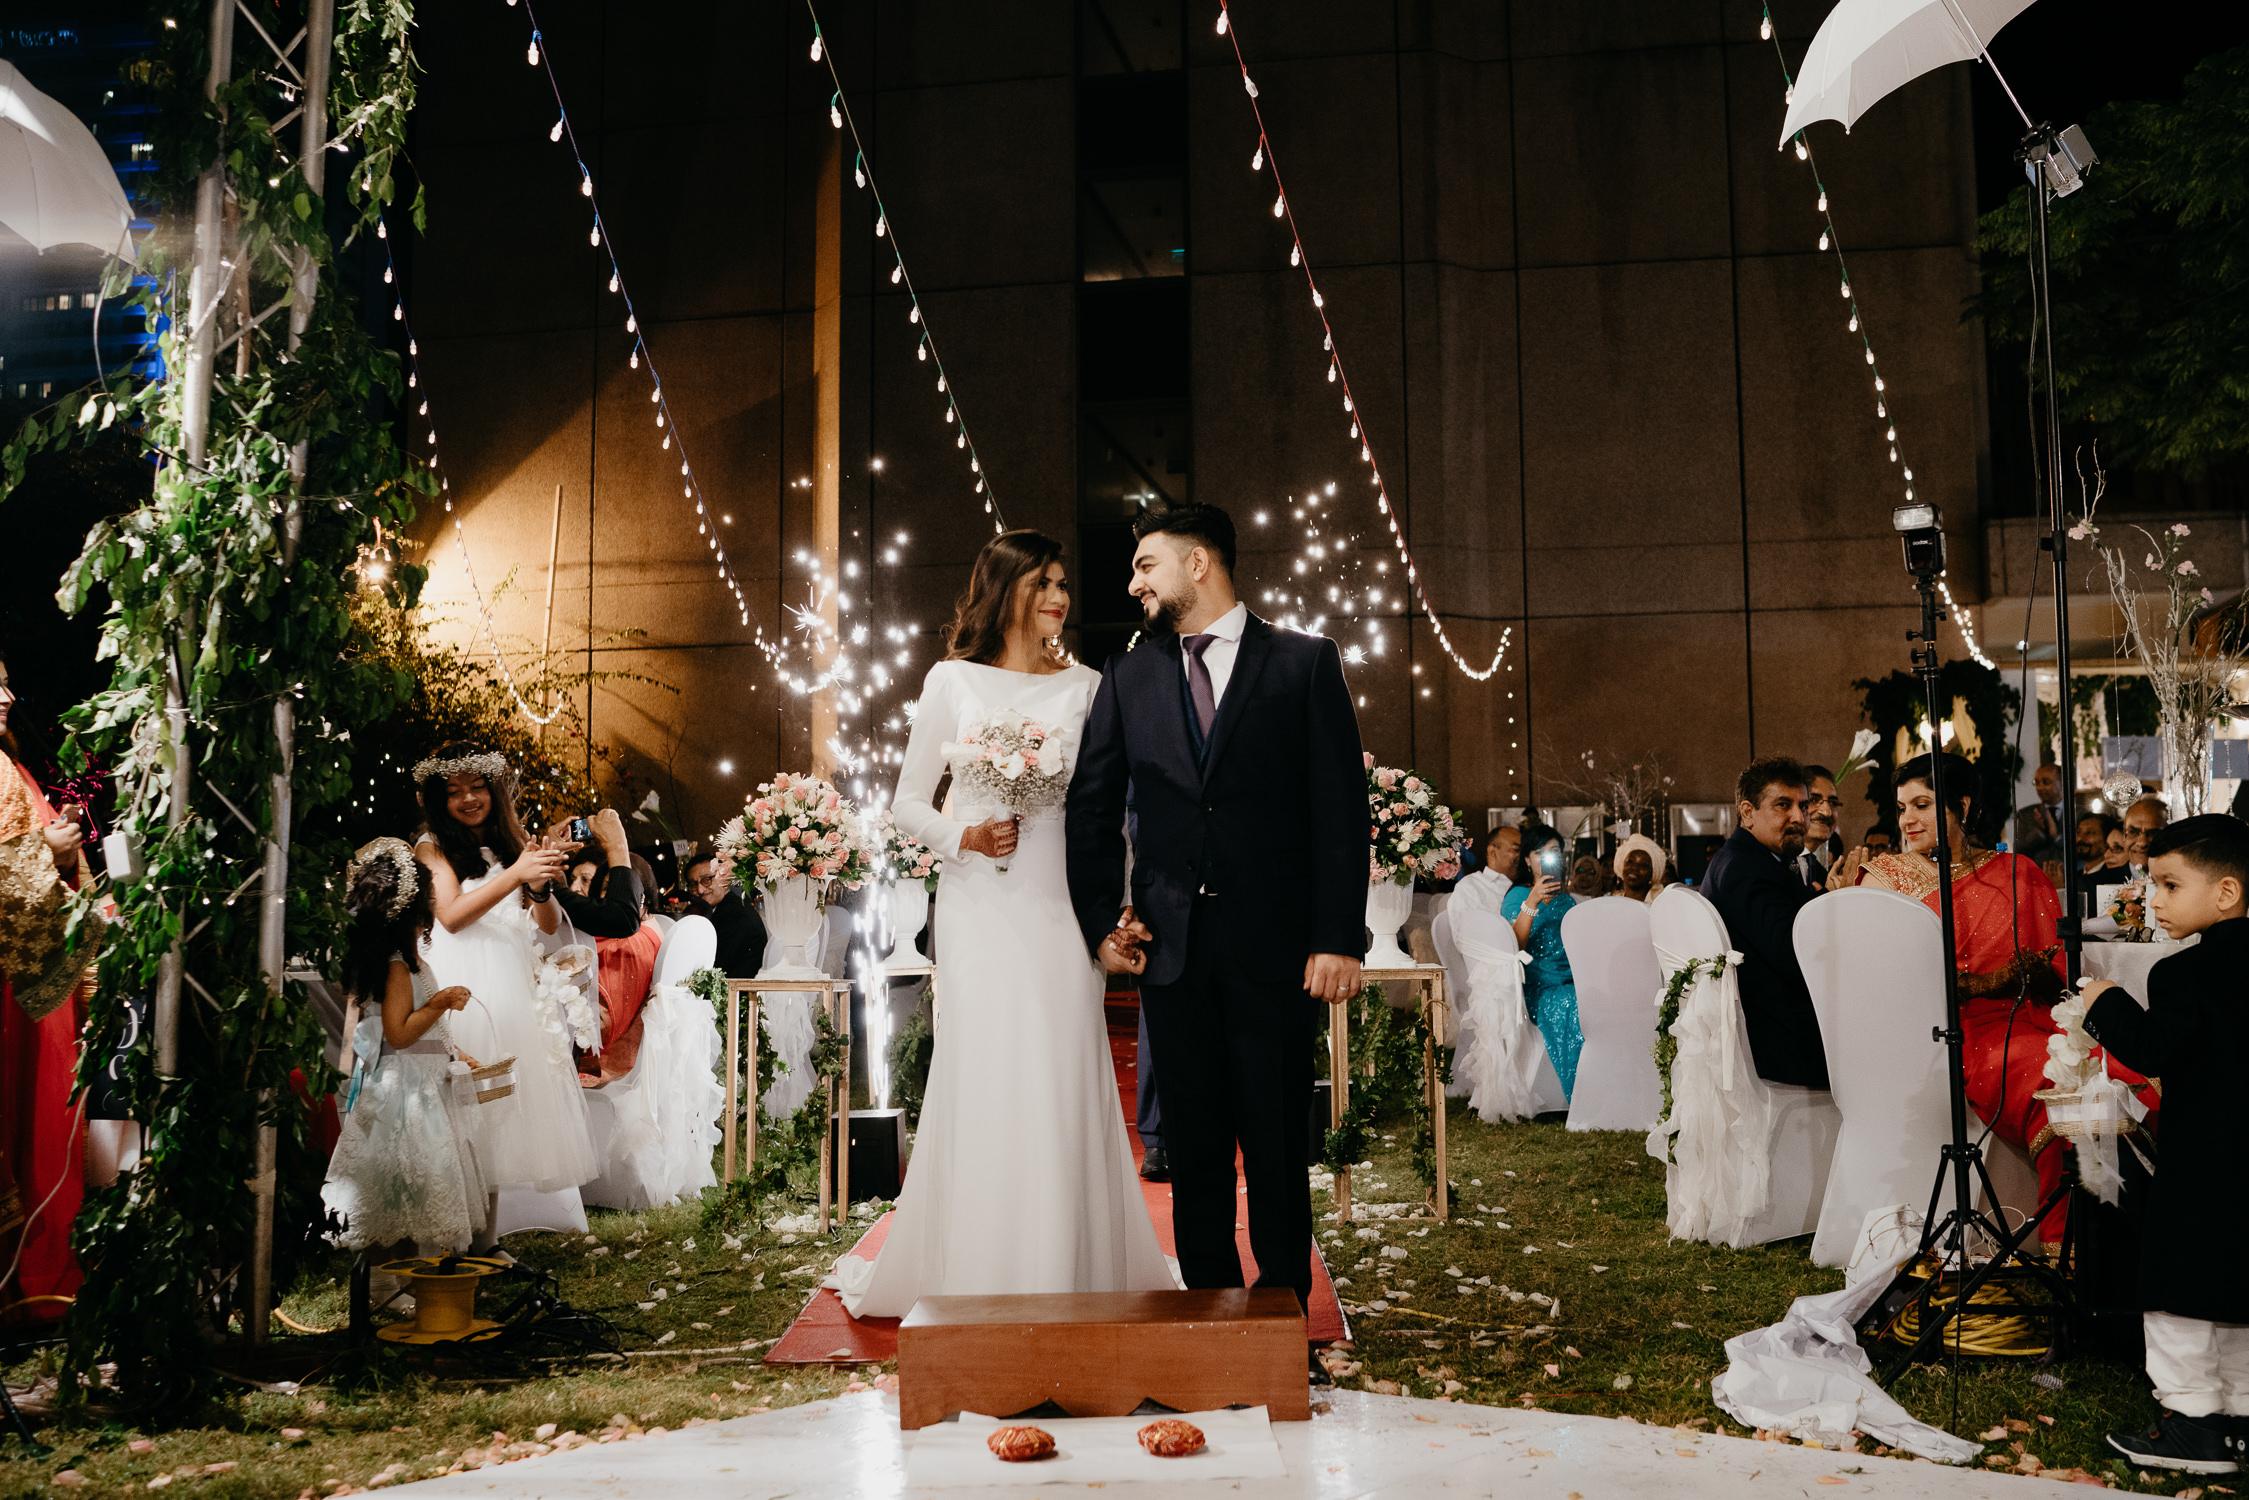 bestemming bruiloft fotografie amsterdam